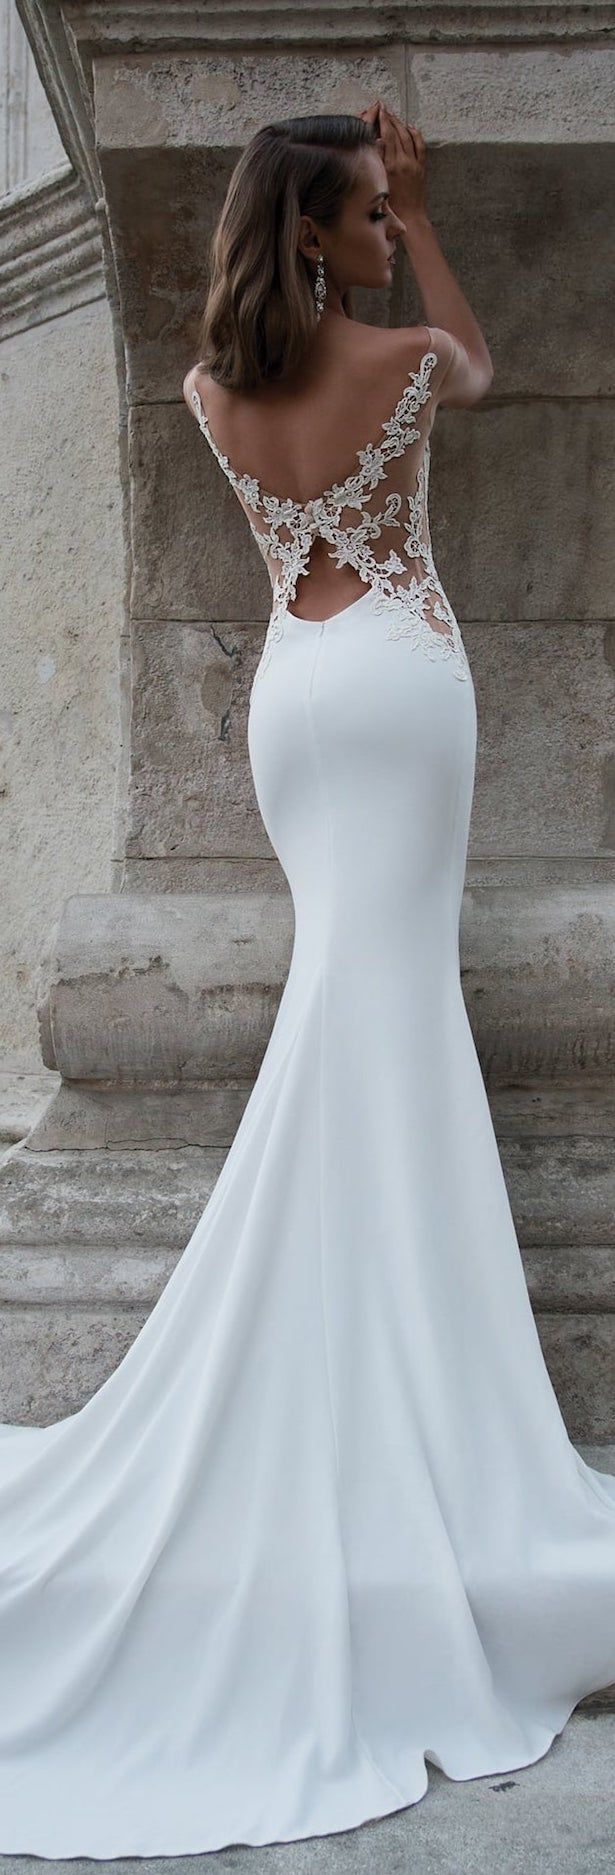 435 best Wedding ideas images on Pinterest | Short wedding gowns ...